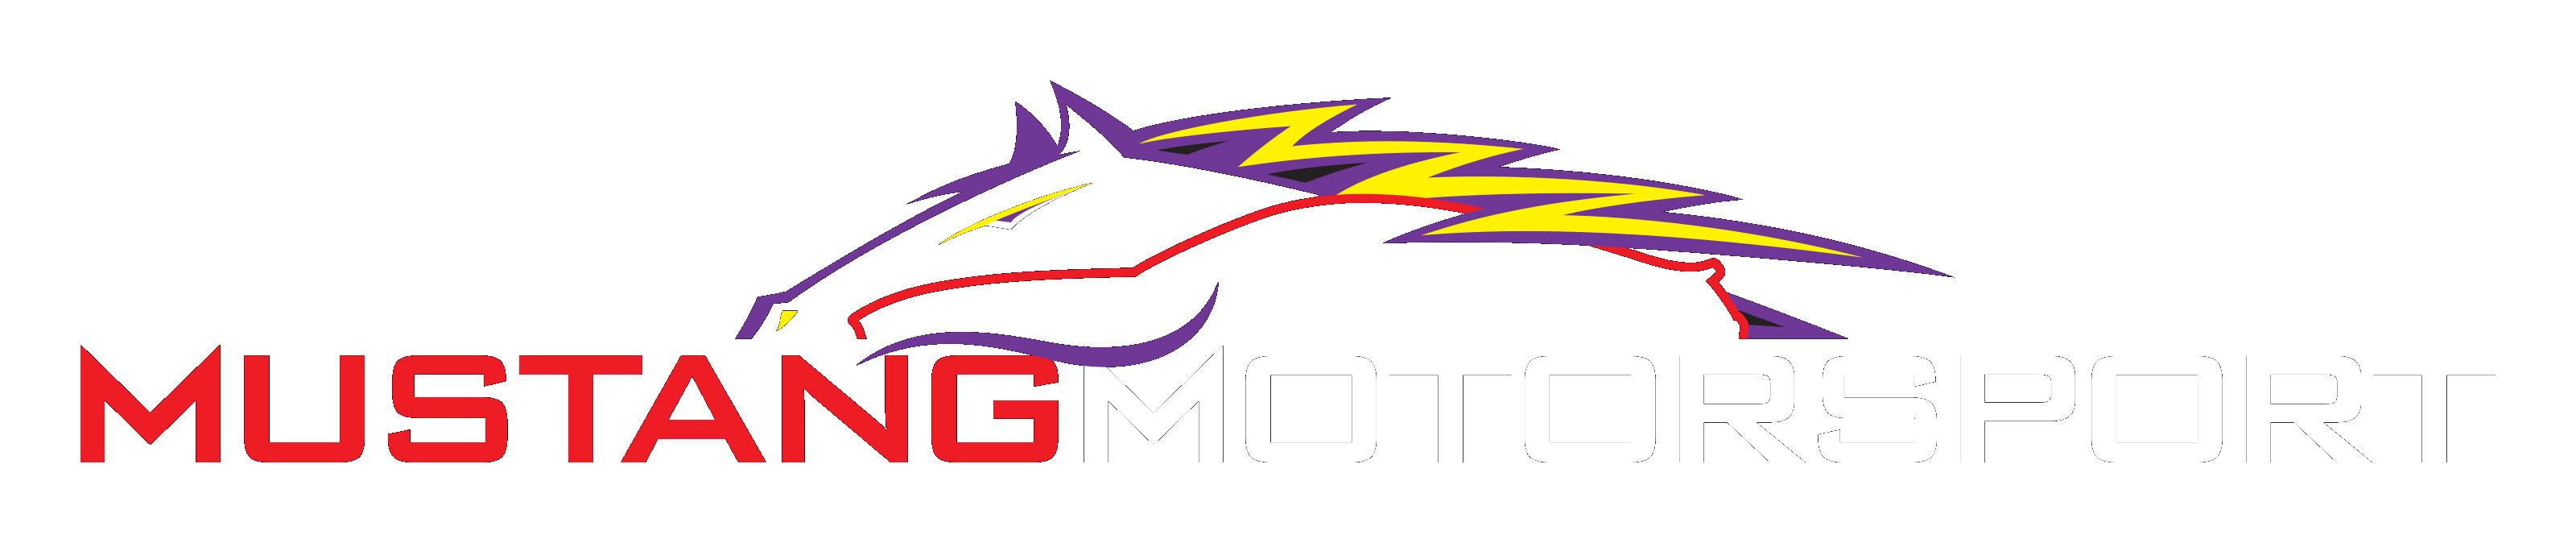 Mustang-Motorsport